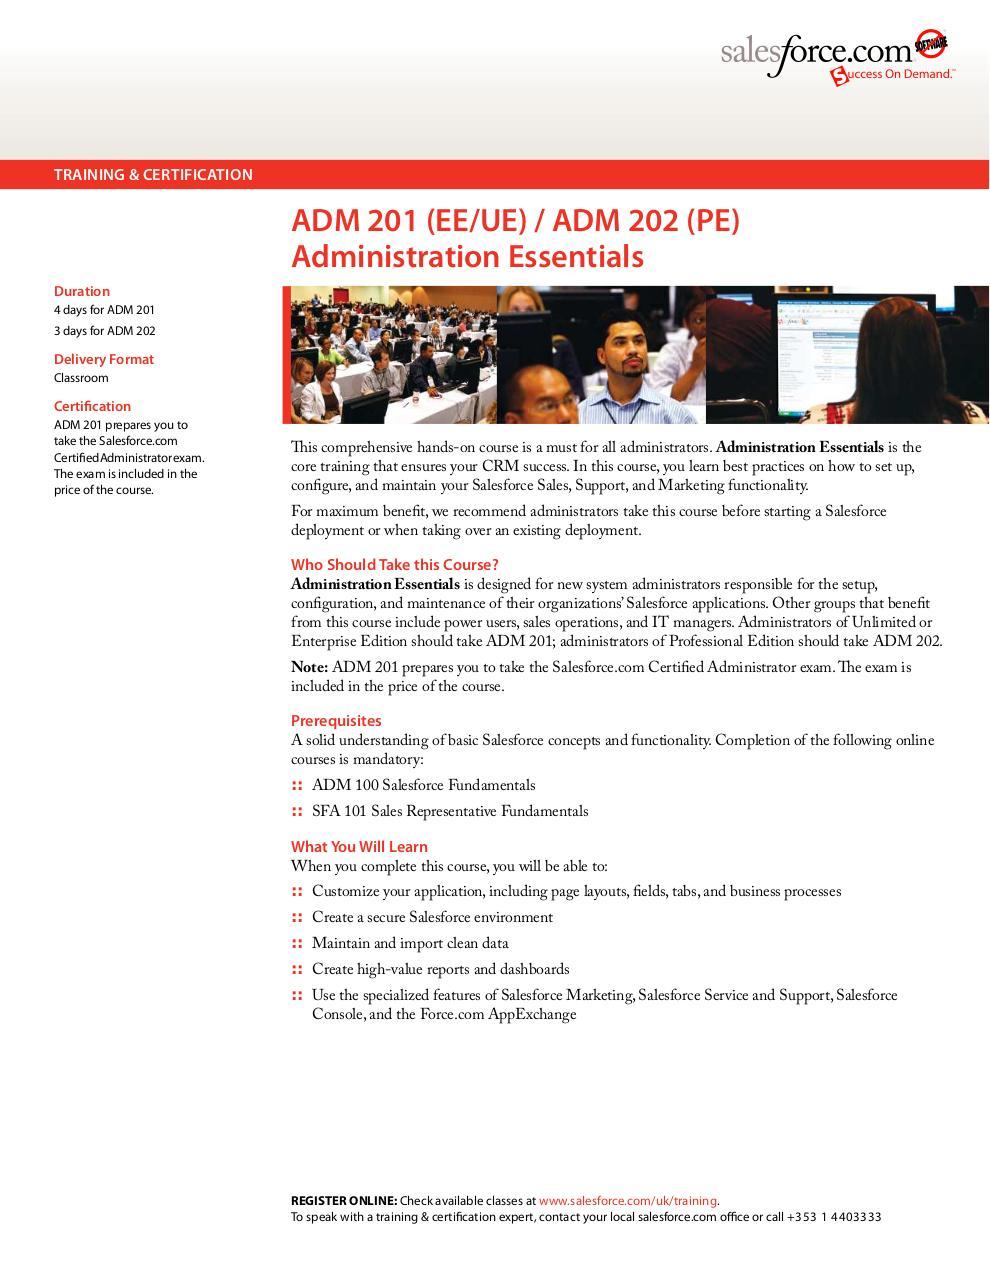 Ds Adm201 202 071108 Uk Dsadm201202pdf Fichier Pdf